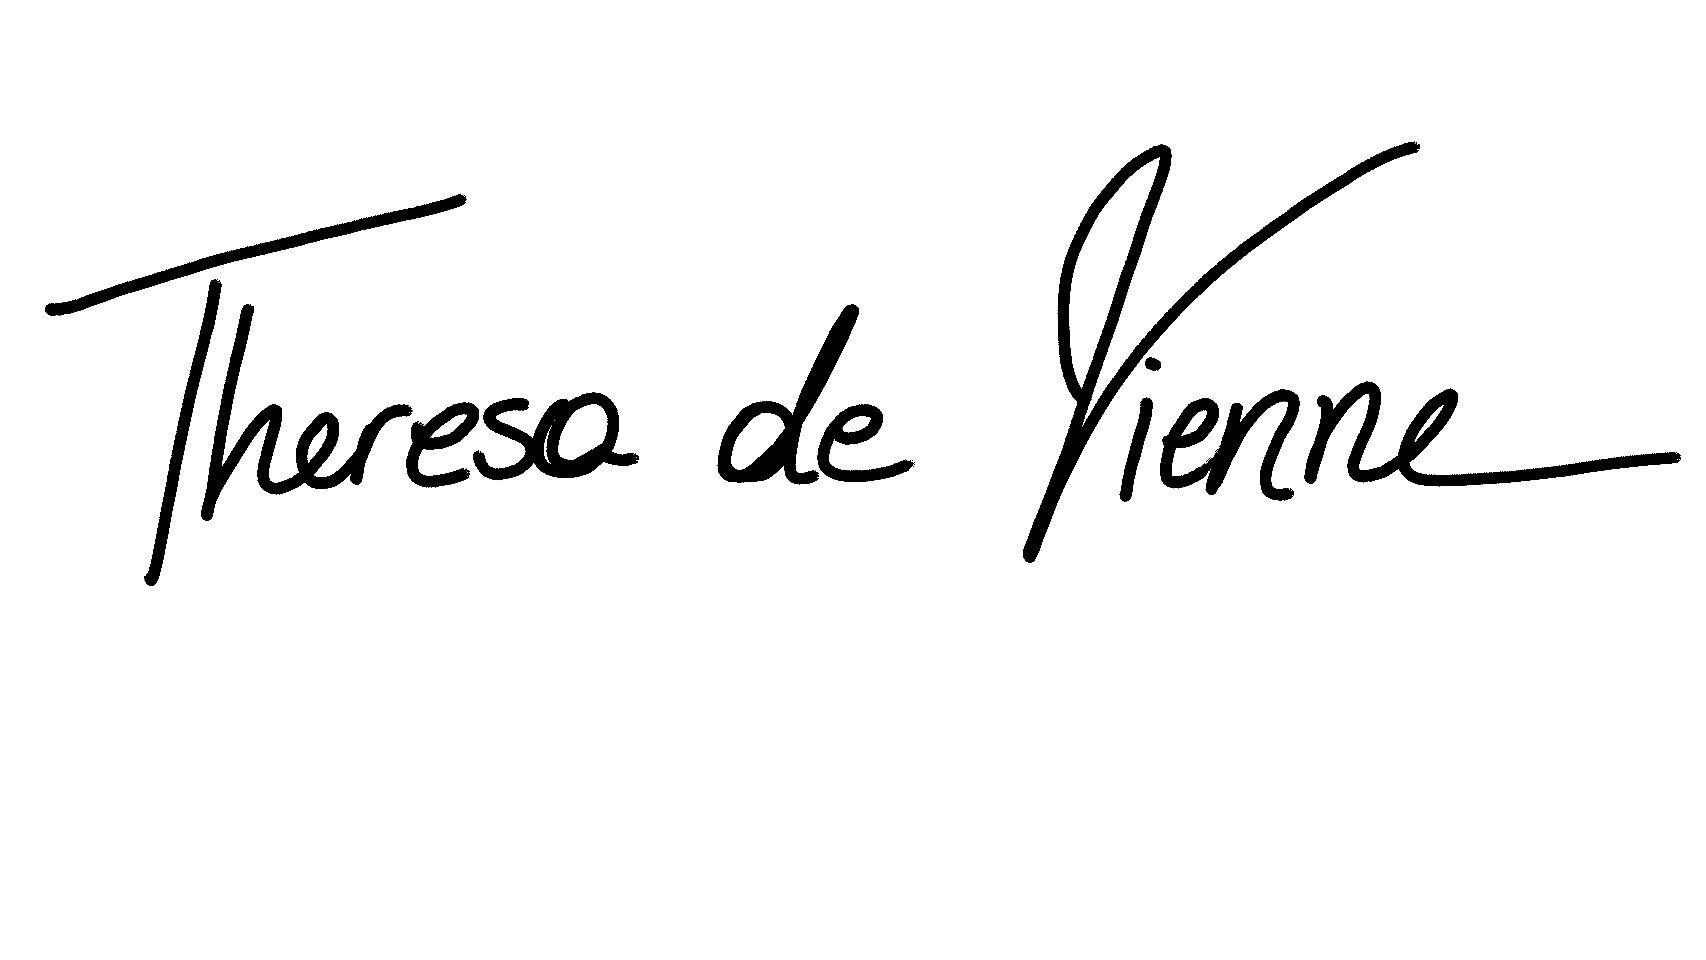 Theresa de Vienne